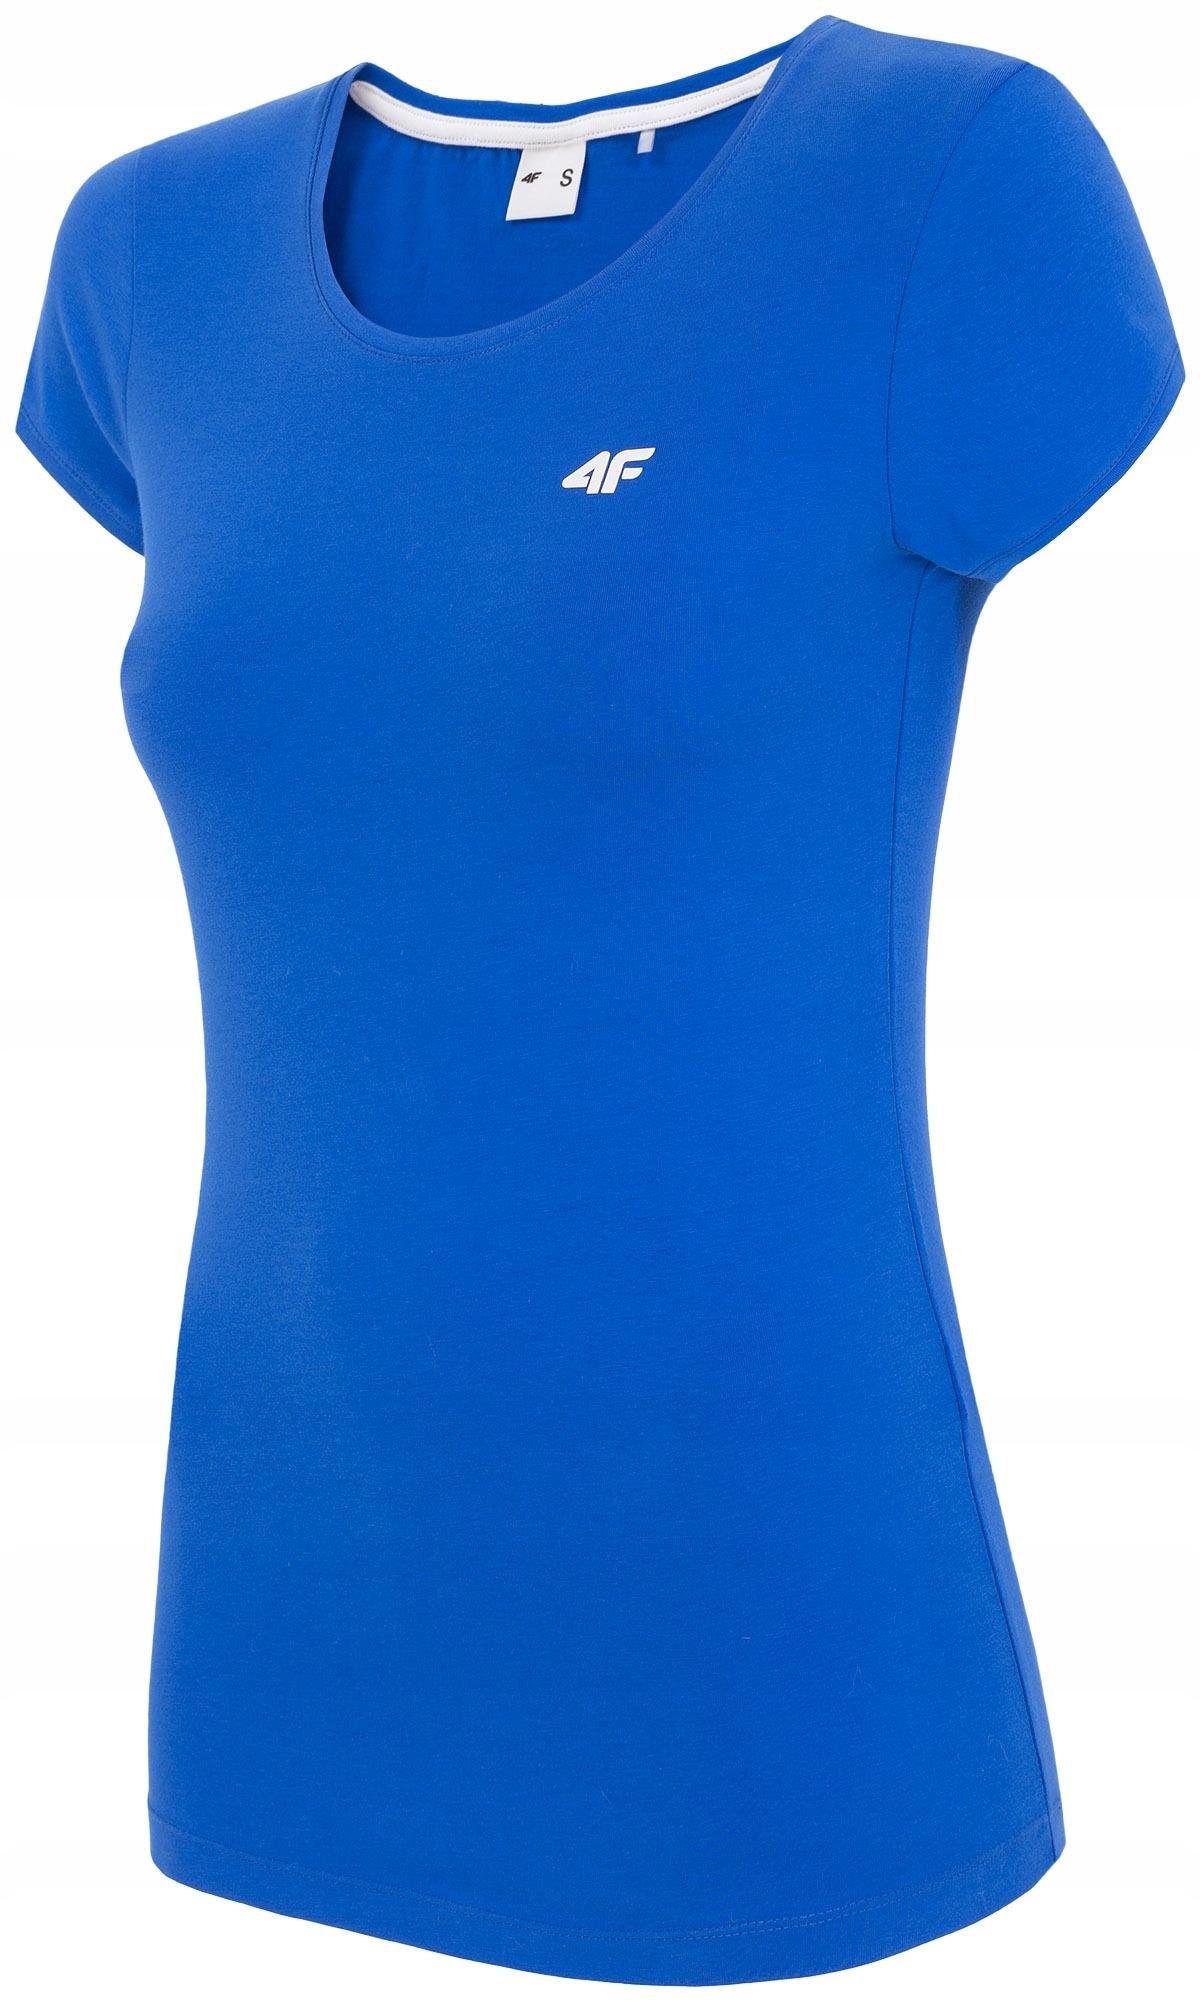 4F Damska Koszulka T-Shirt L18 TSD002 > XXL